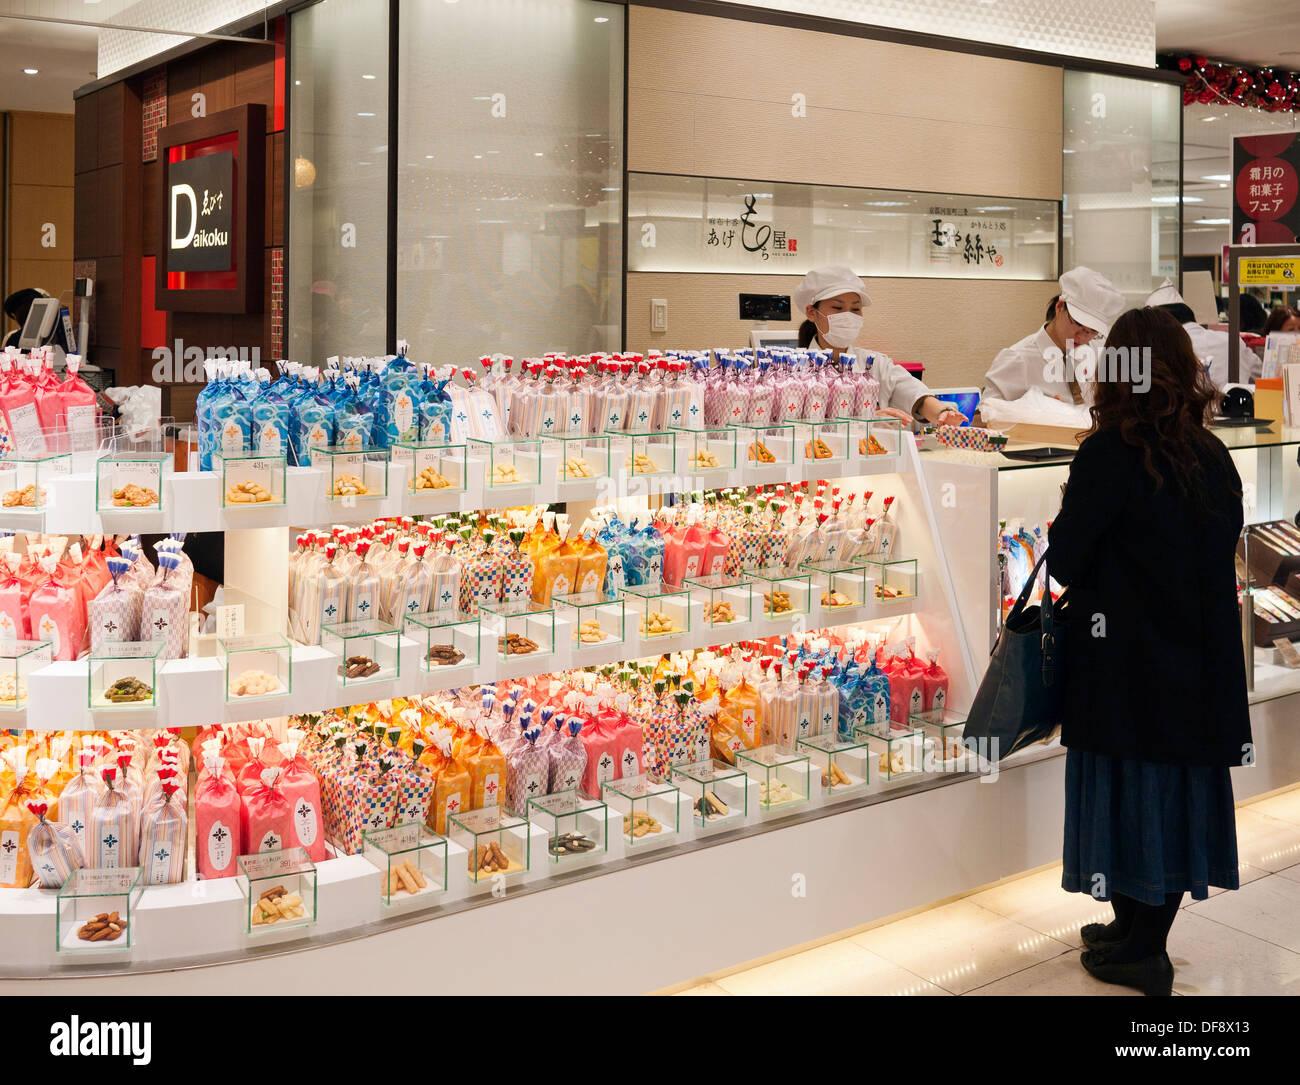 Japanese Sweet Shop Stock Photos & Japanese Sweet Shop